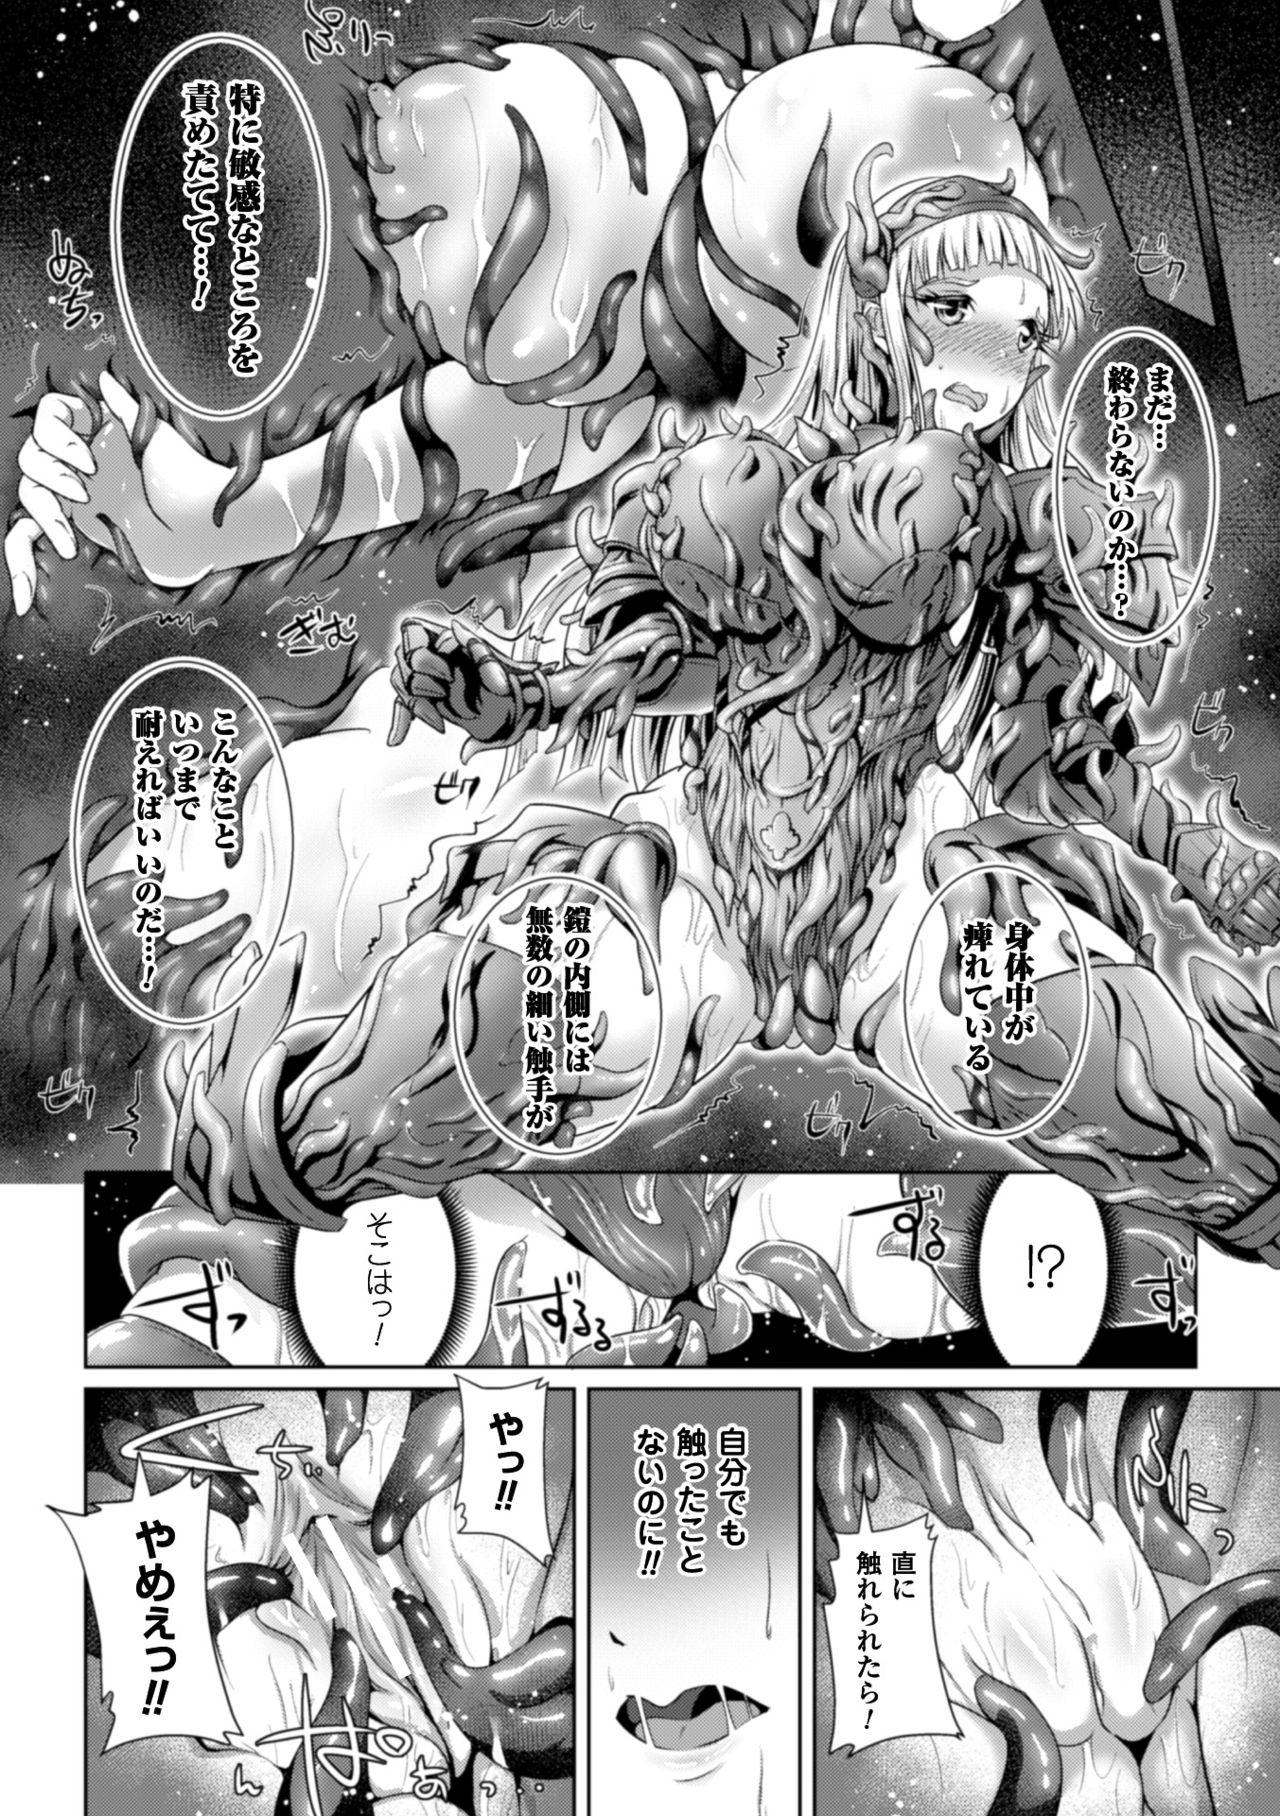 2D Comic Magazine Shokushu Yoroi ni Zenshin o Okasare Mugen Zecchou! Vol. 5 13